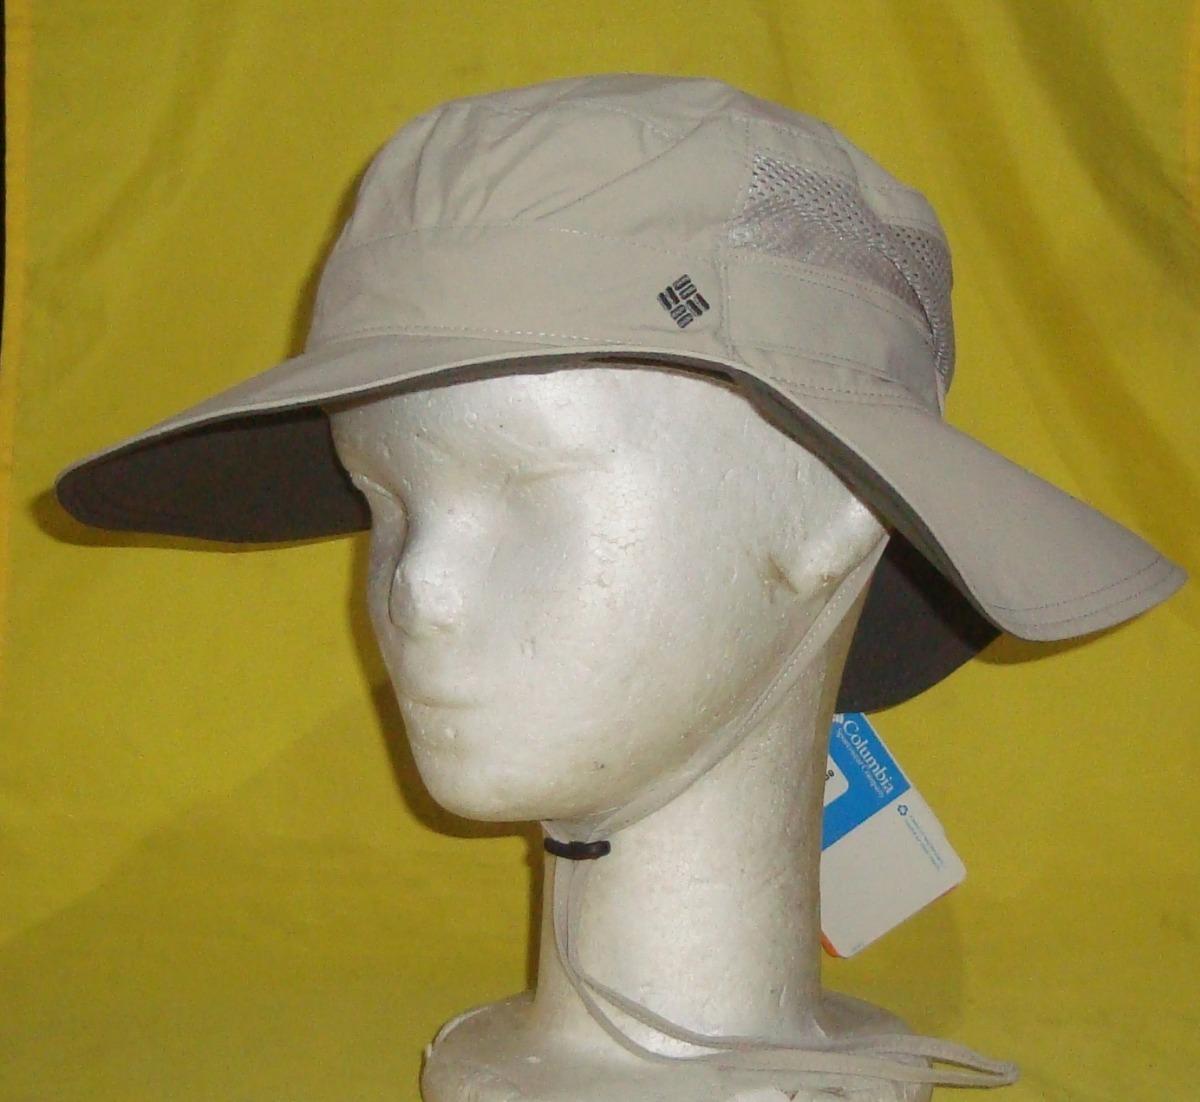 d00b45ccc8b26 sombrero columbia bora bora booney hueso pesca caza. Cargando zoom.